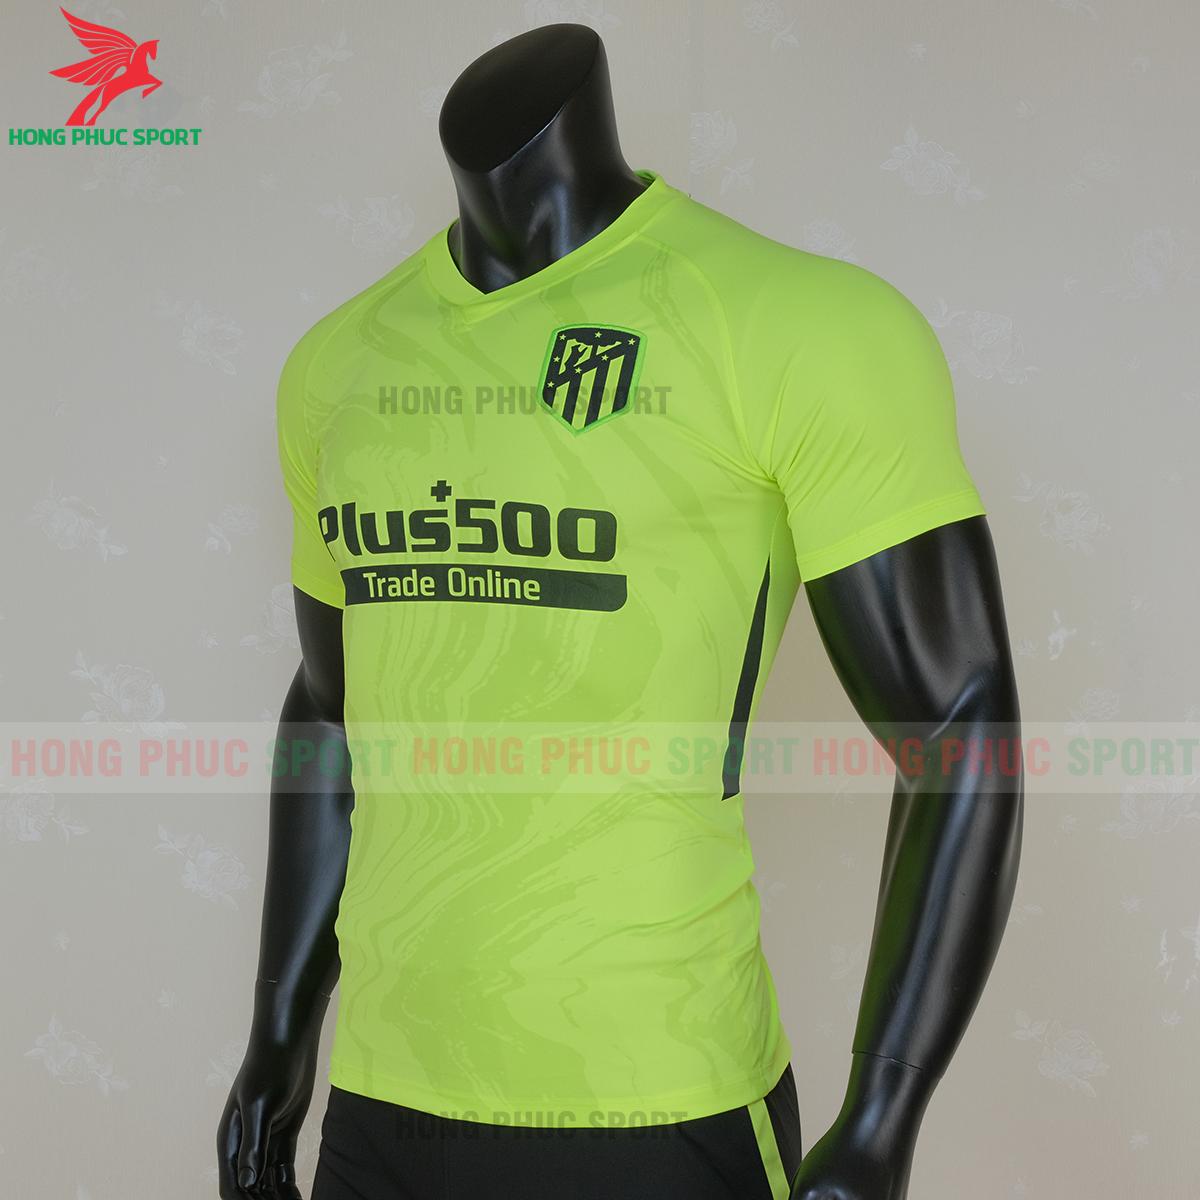 https://cdn.hongphucsport.com/unsafe/s4.shopbay.vn/files/285/ao-atletico-madrid-2020-2021-mau-thu-3-3-5f6d4aa610d19.png